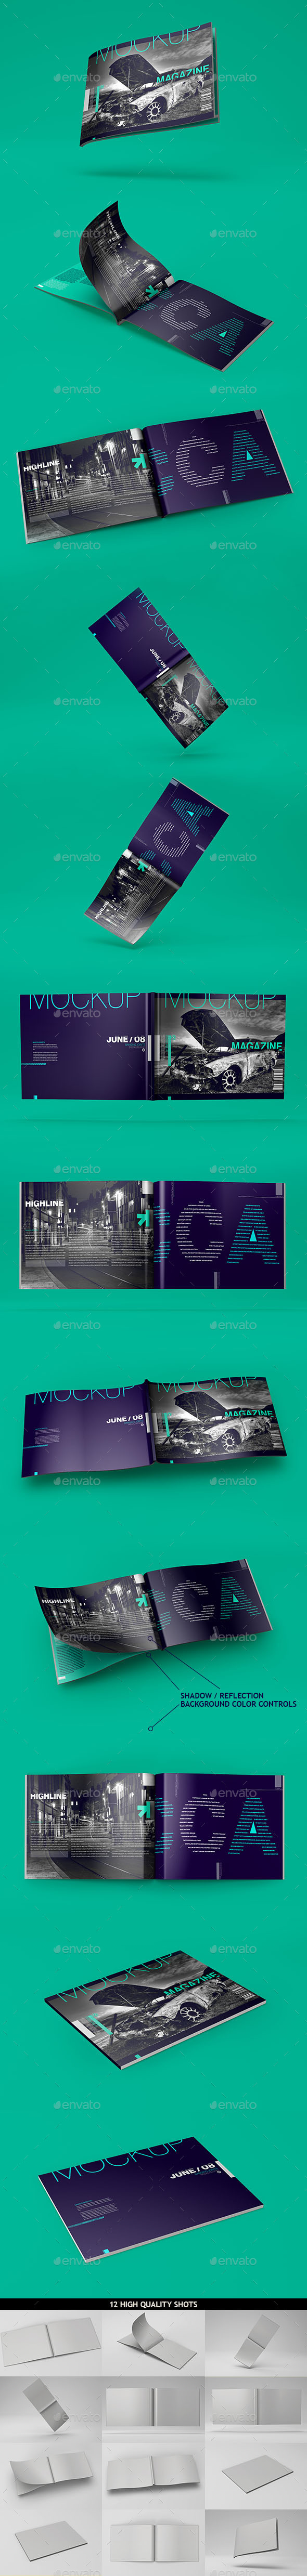 Horizontal A4 Magazine Catalog Mockup - Magazines Print